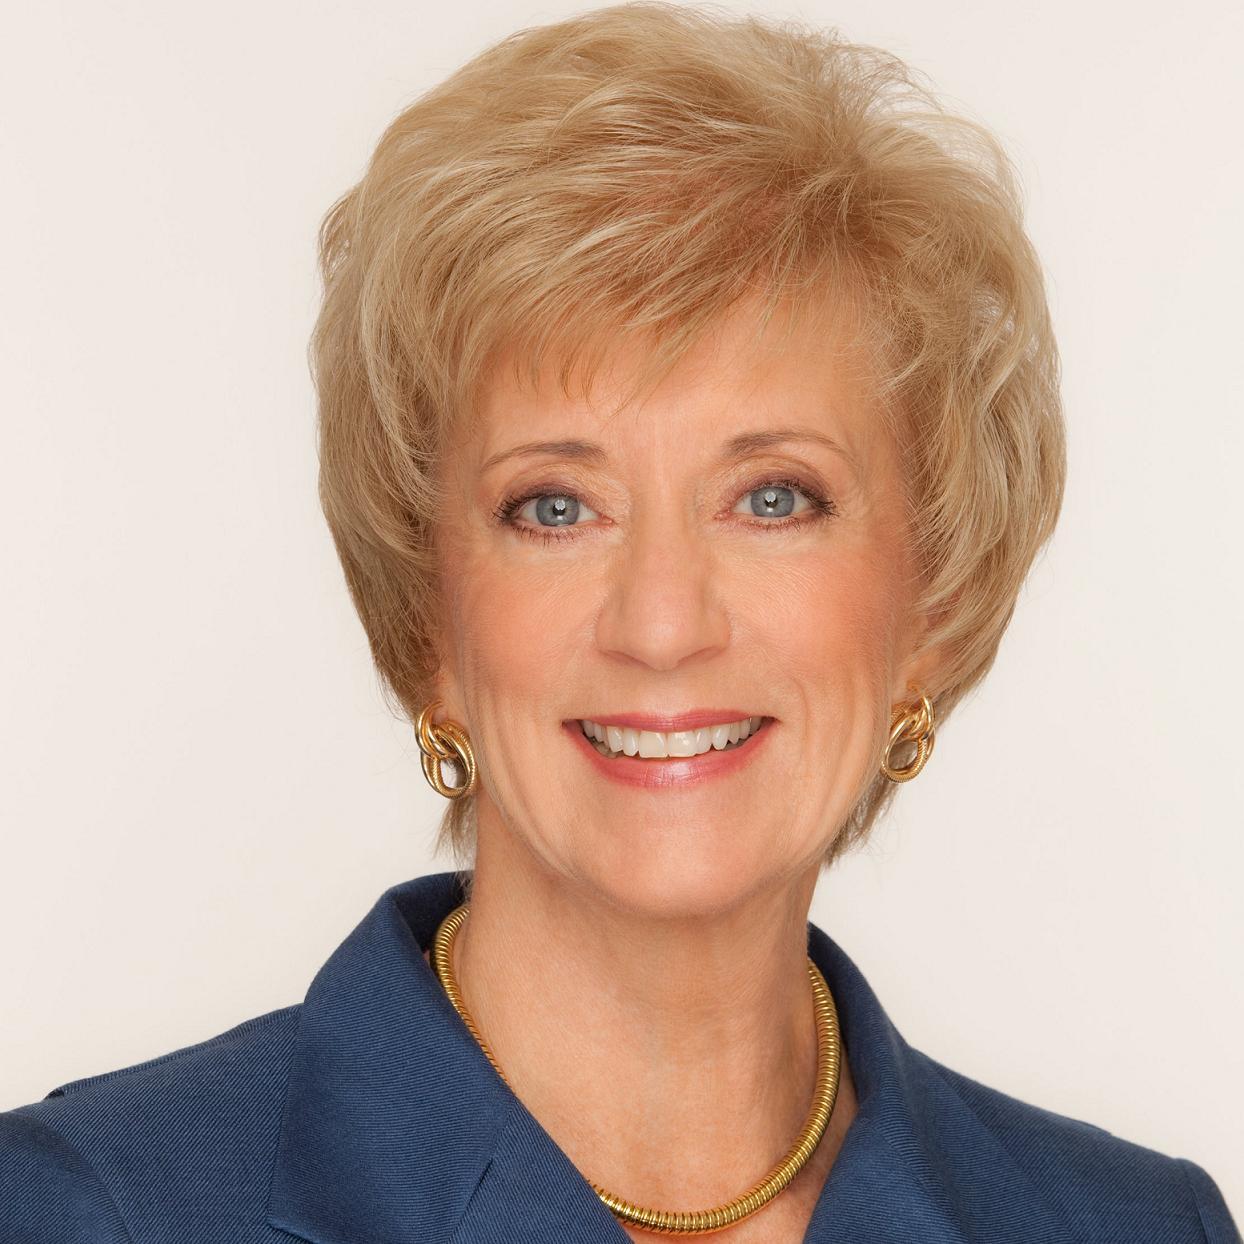 Linda McMahon | Bio, Net Worth, Facts